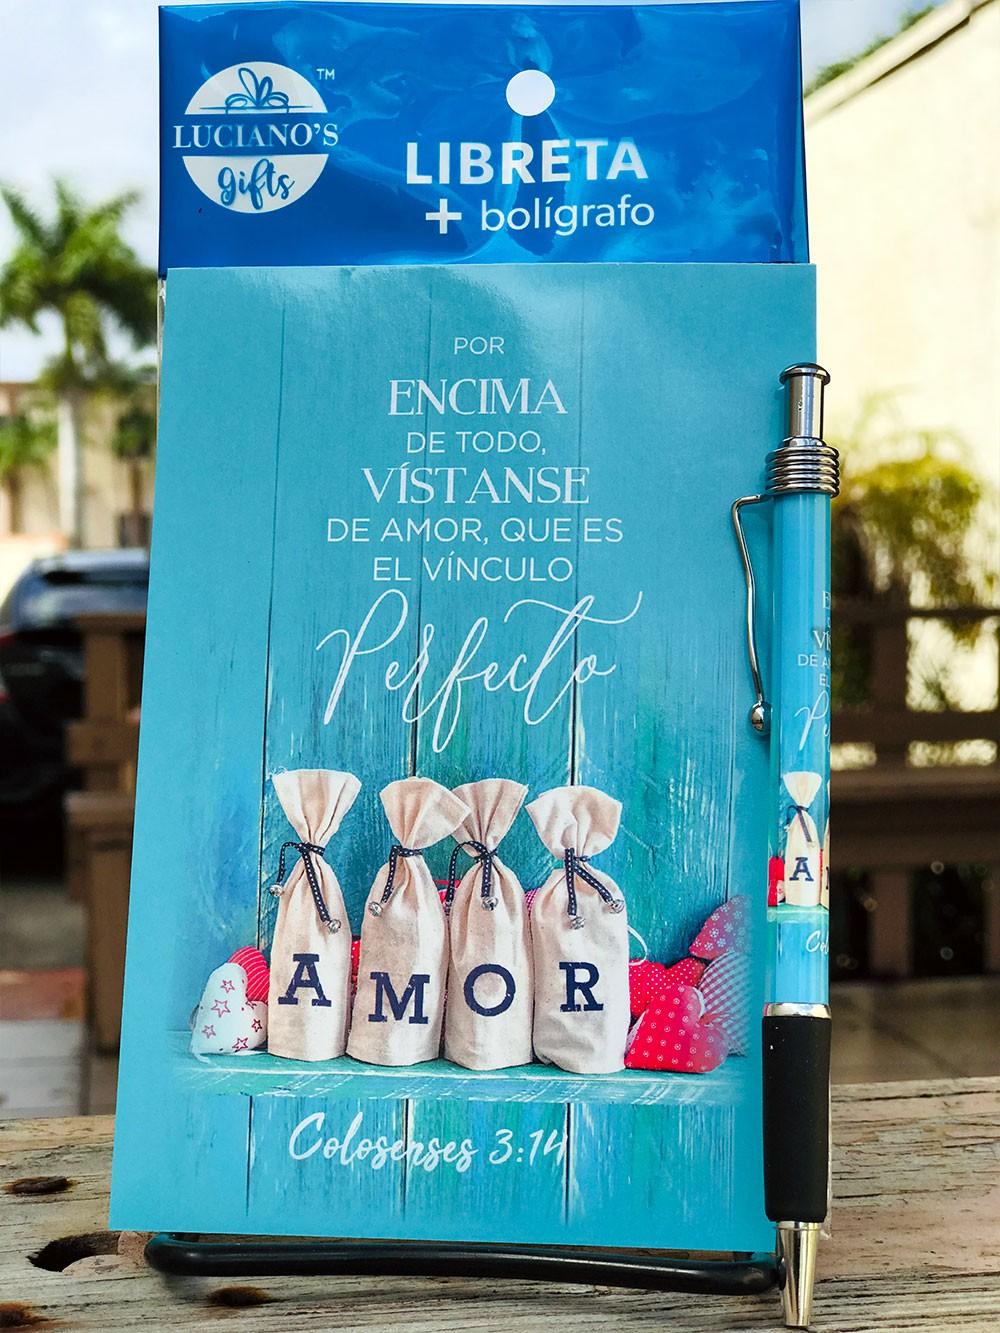 Libreta Pack + Boligrafo Amor Lucianos